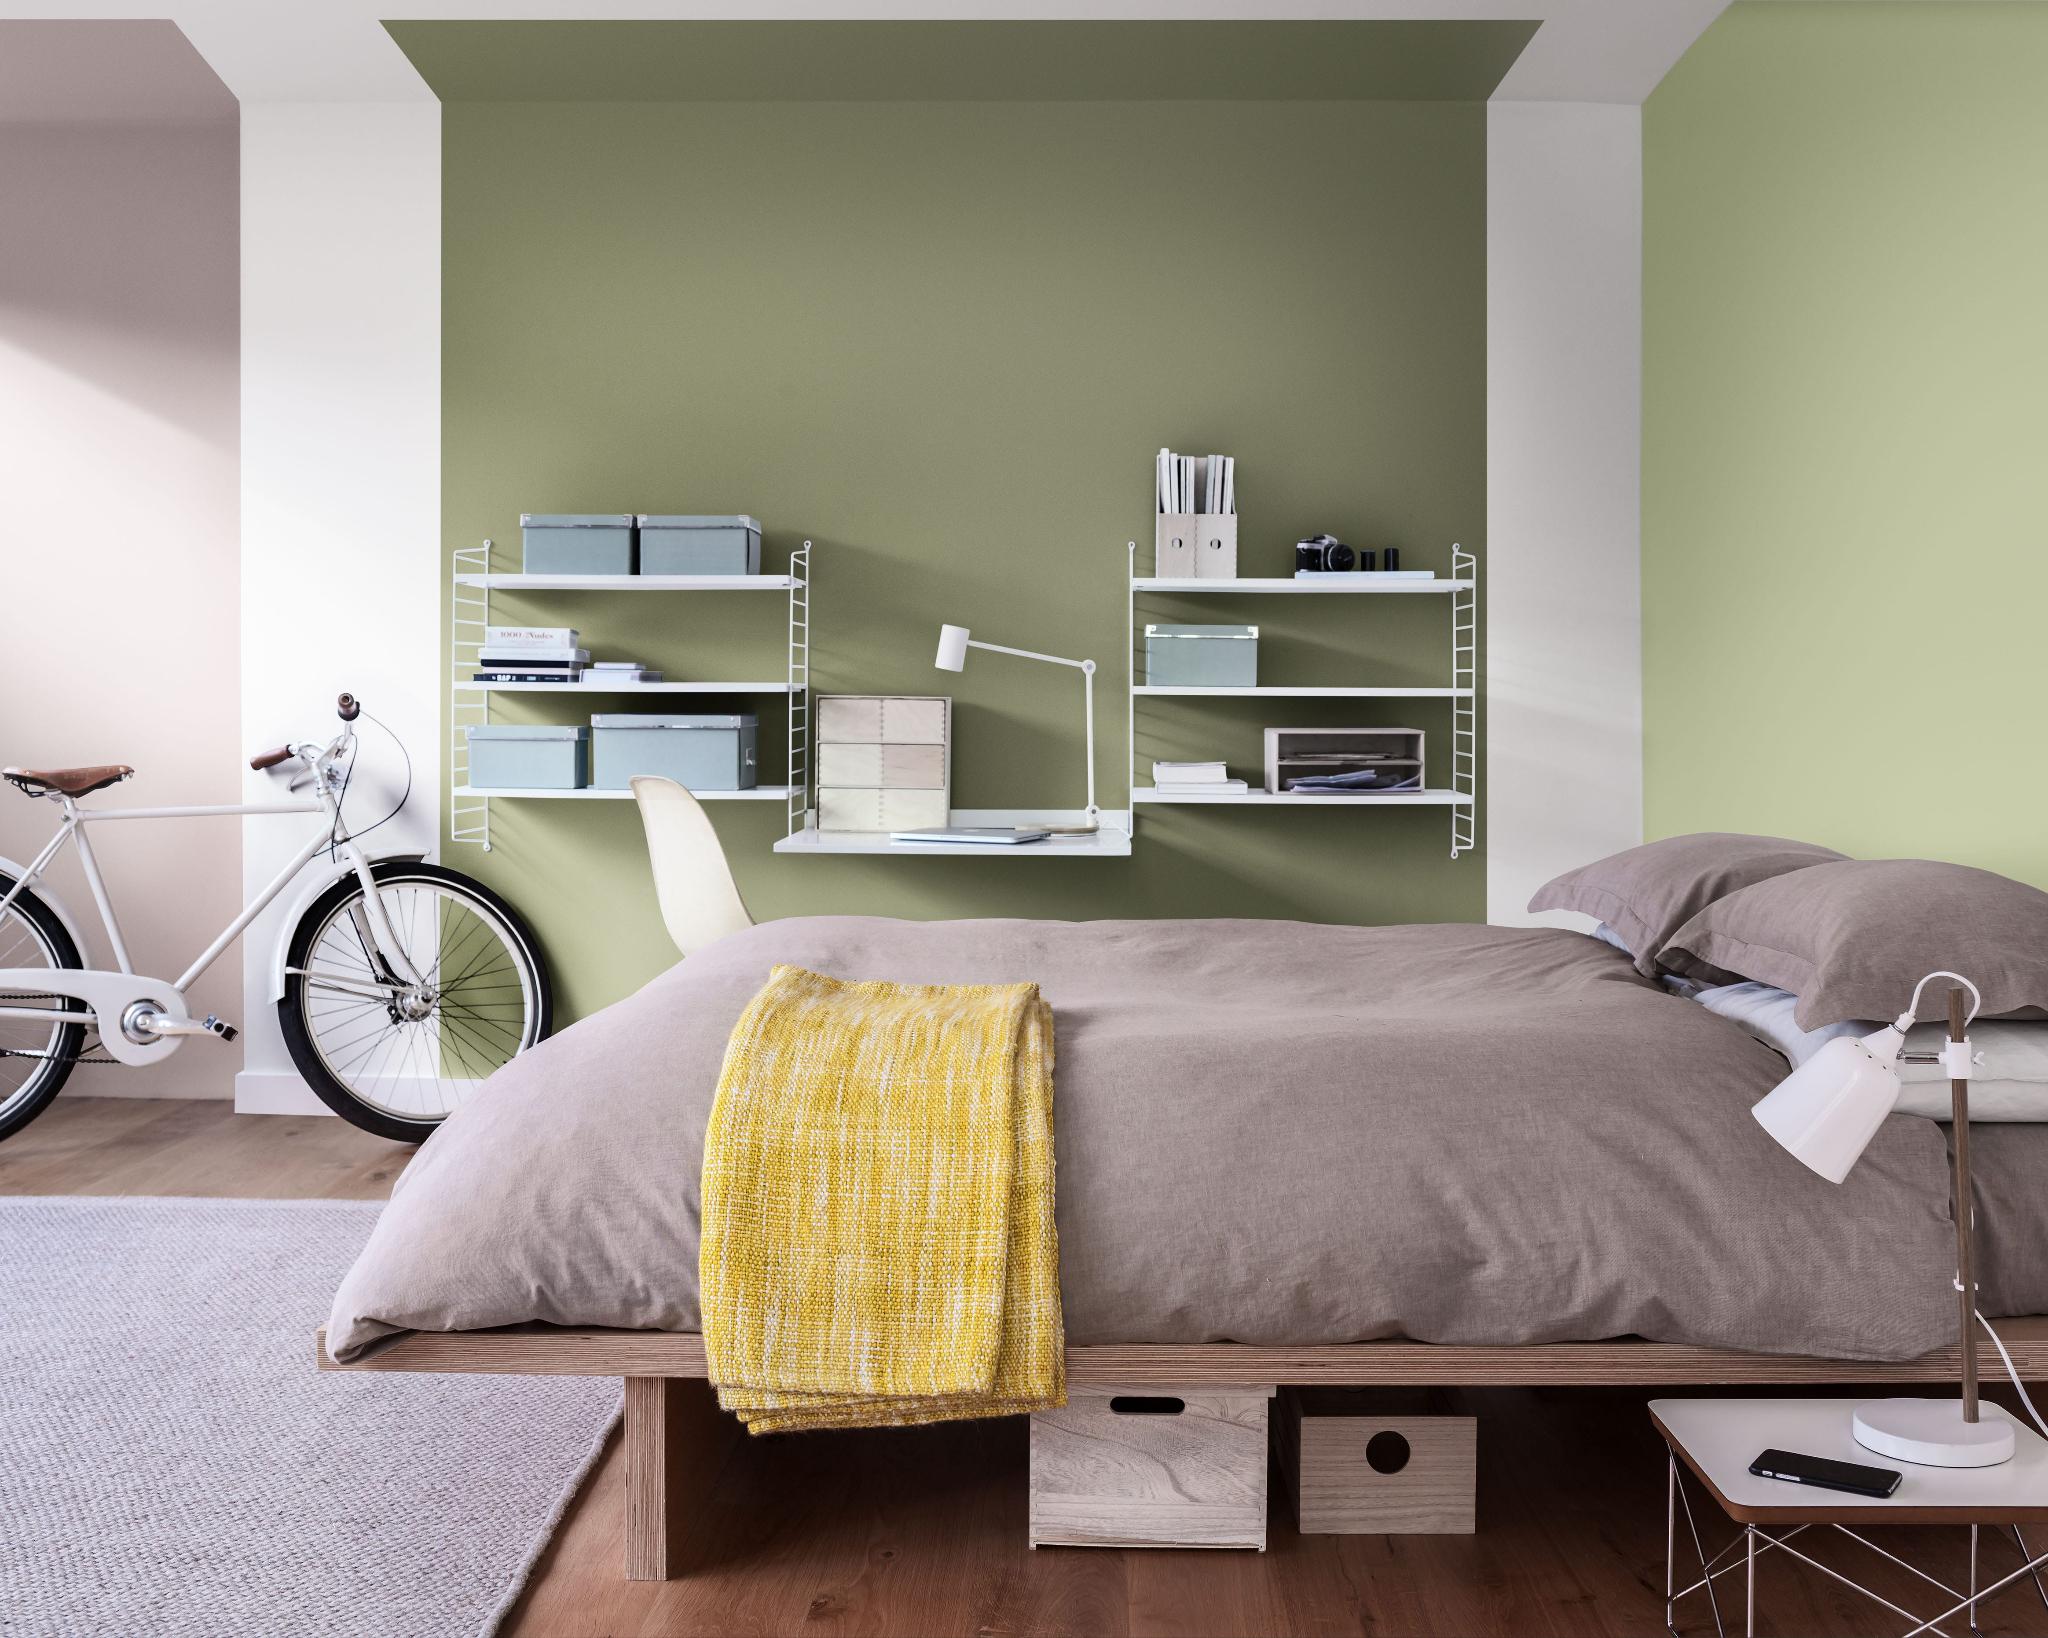 cf18_consumer_playful_slough_bedroom_1638-min.jpg